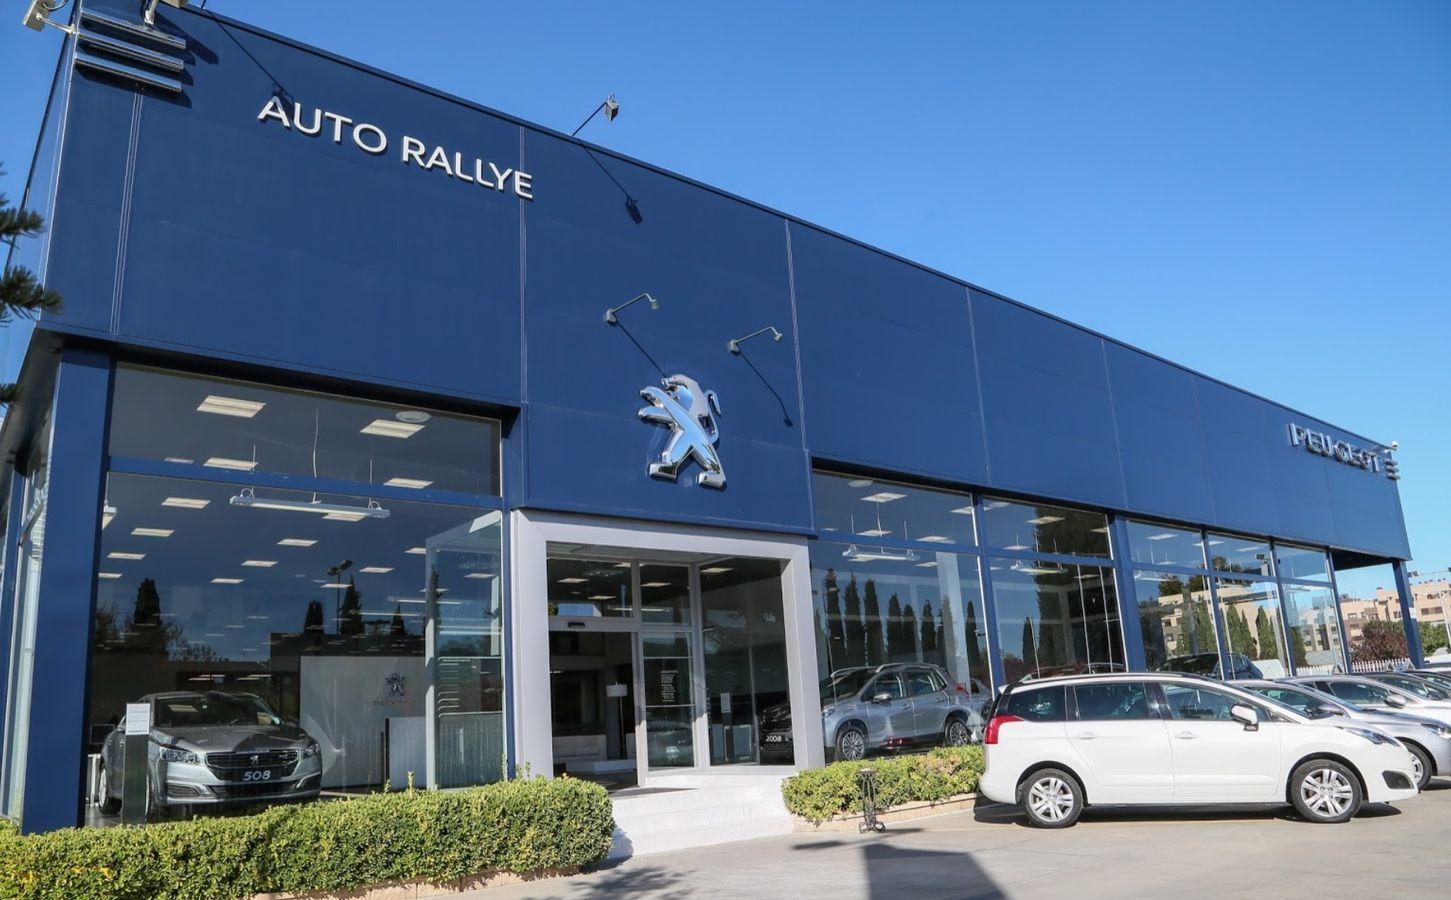 GRUPO AUTO RALLYE - PEUGEOT 1